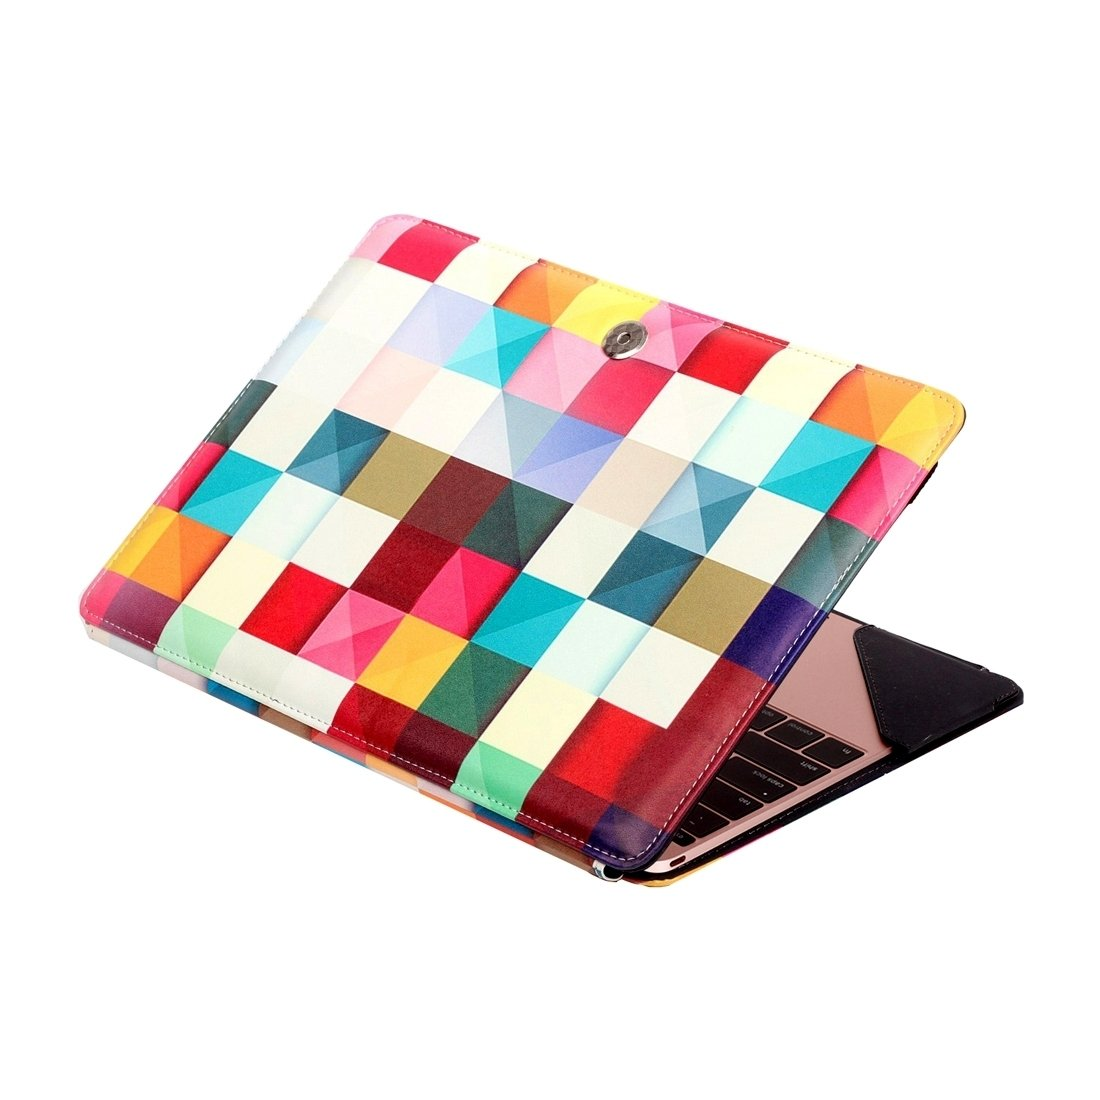 Custodie & carcasa Mac, para Nuevo MacBook 12 pulgadas Retro ...